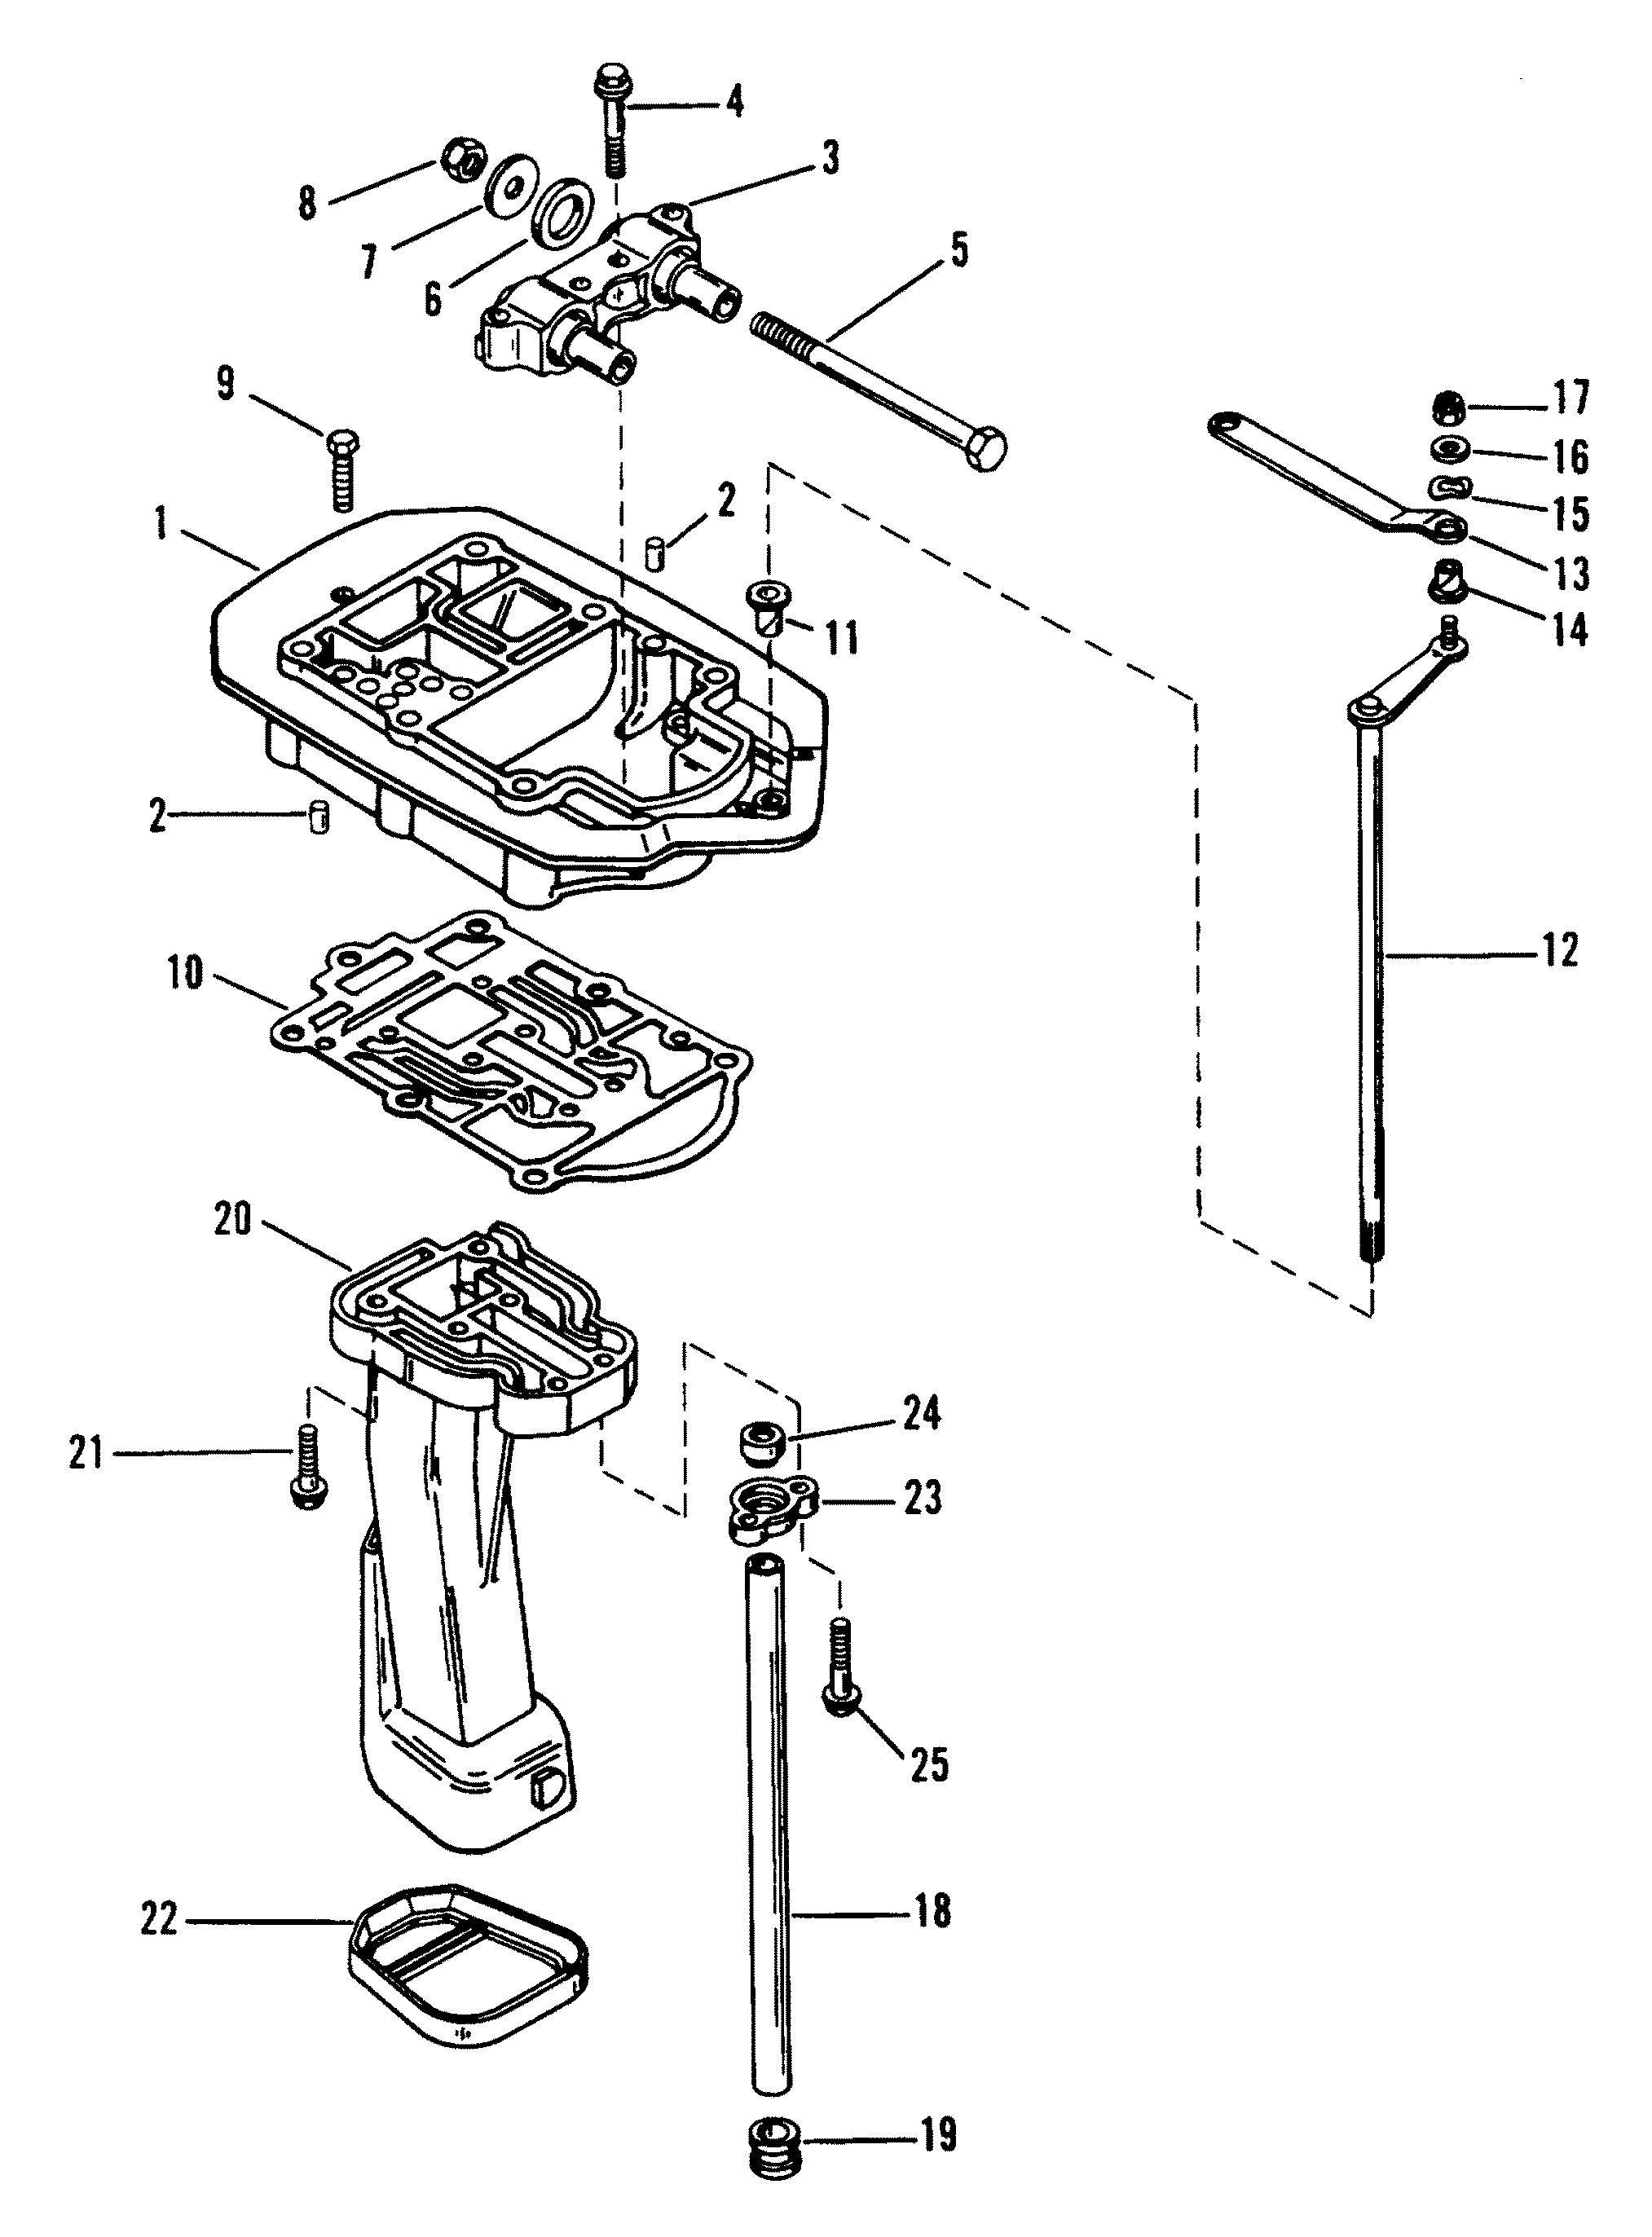 Mercury Outboard Exhaust Diagram - Gramban Mohammedshrine ... on mariner 115 hp wiring diagram, mariner 70 hp wiring diagram, mariner 75 hp wiring diagram, mariner 25 hp wiring diagram, mariner 8 hp wiring diagram, mariner 60 hp wiring diagram,